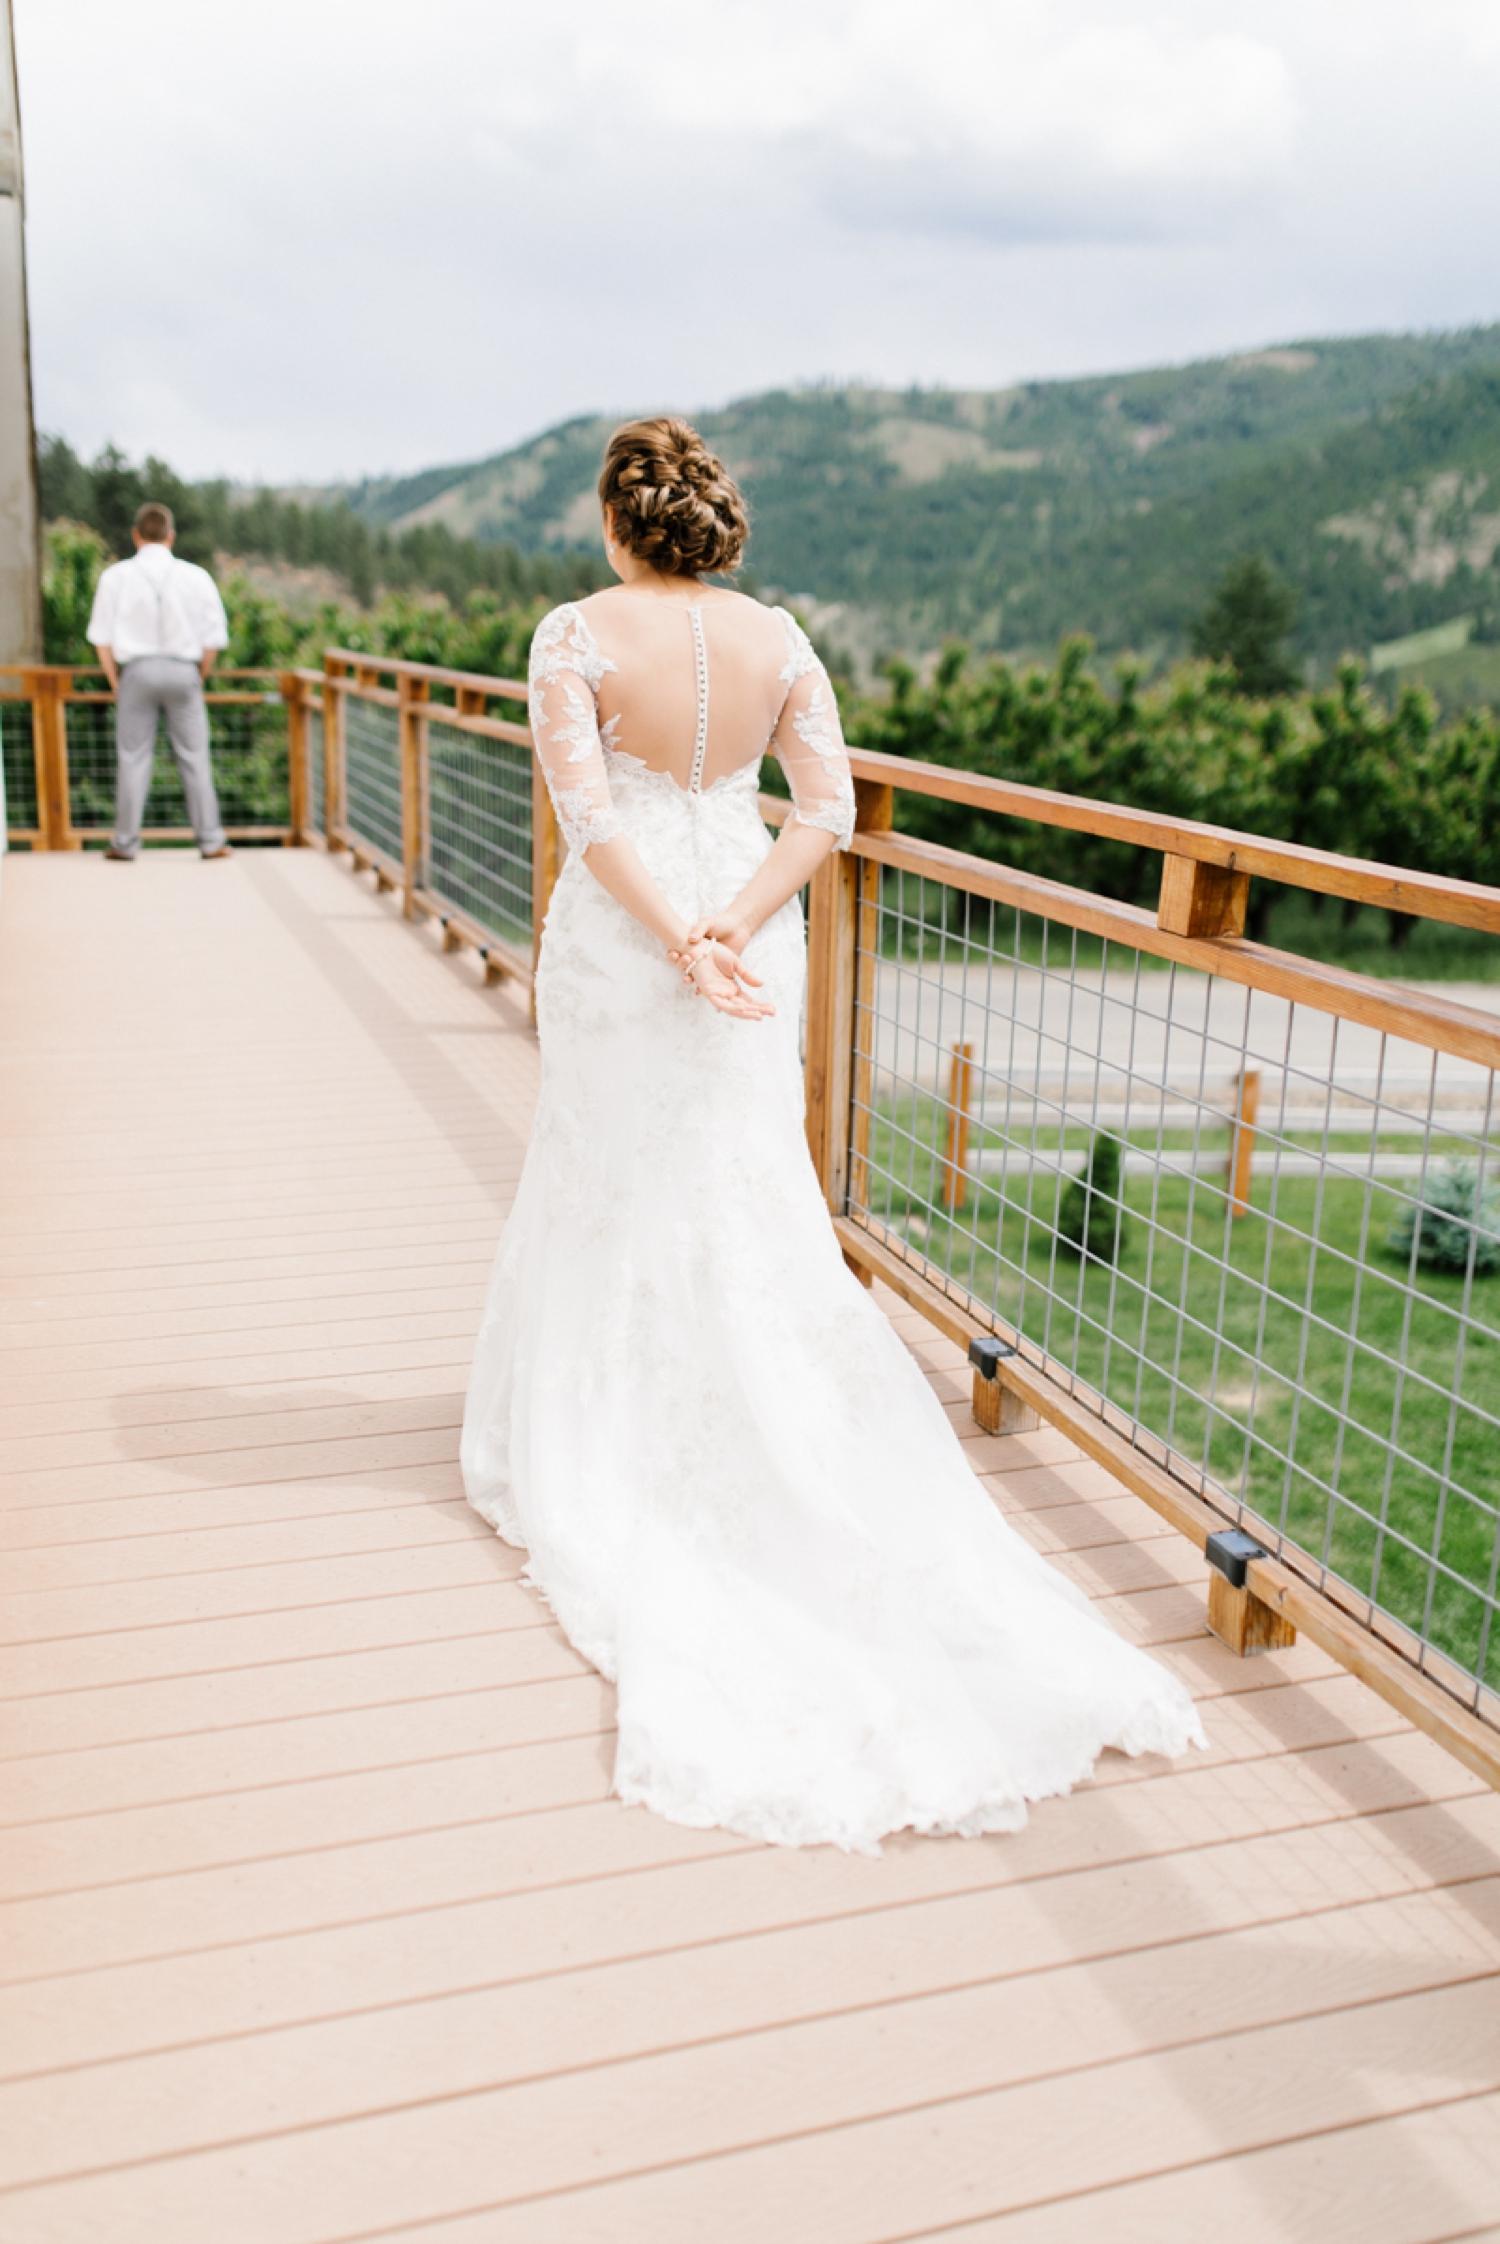 Wenatchee Wedding Photographer   Hampton Hideaway   Summer Rustic Wedding Eastern Washington   Emma Rose Company   Pastel Wedding Inspiration   Lace Wedding   Pacific Northwest Wedding 19.jpg